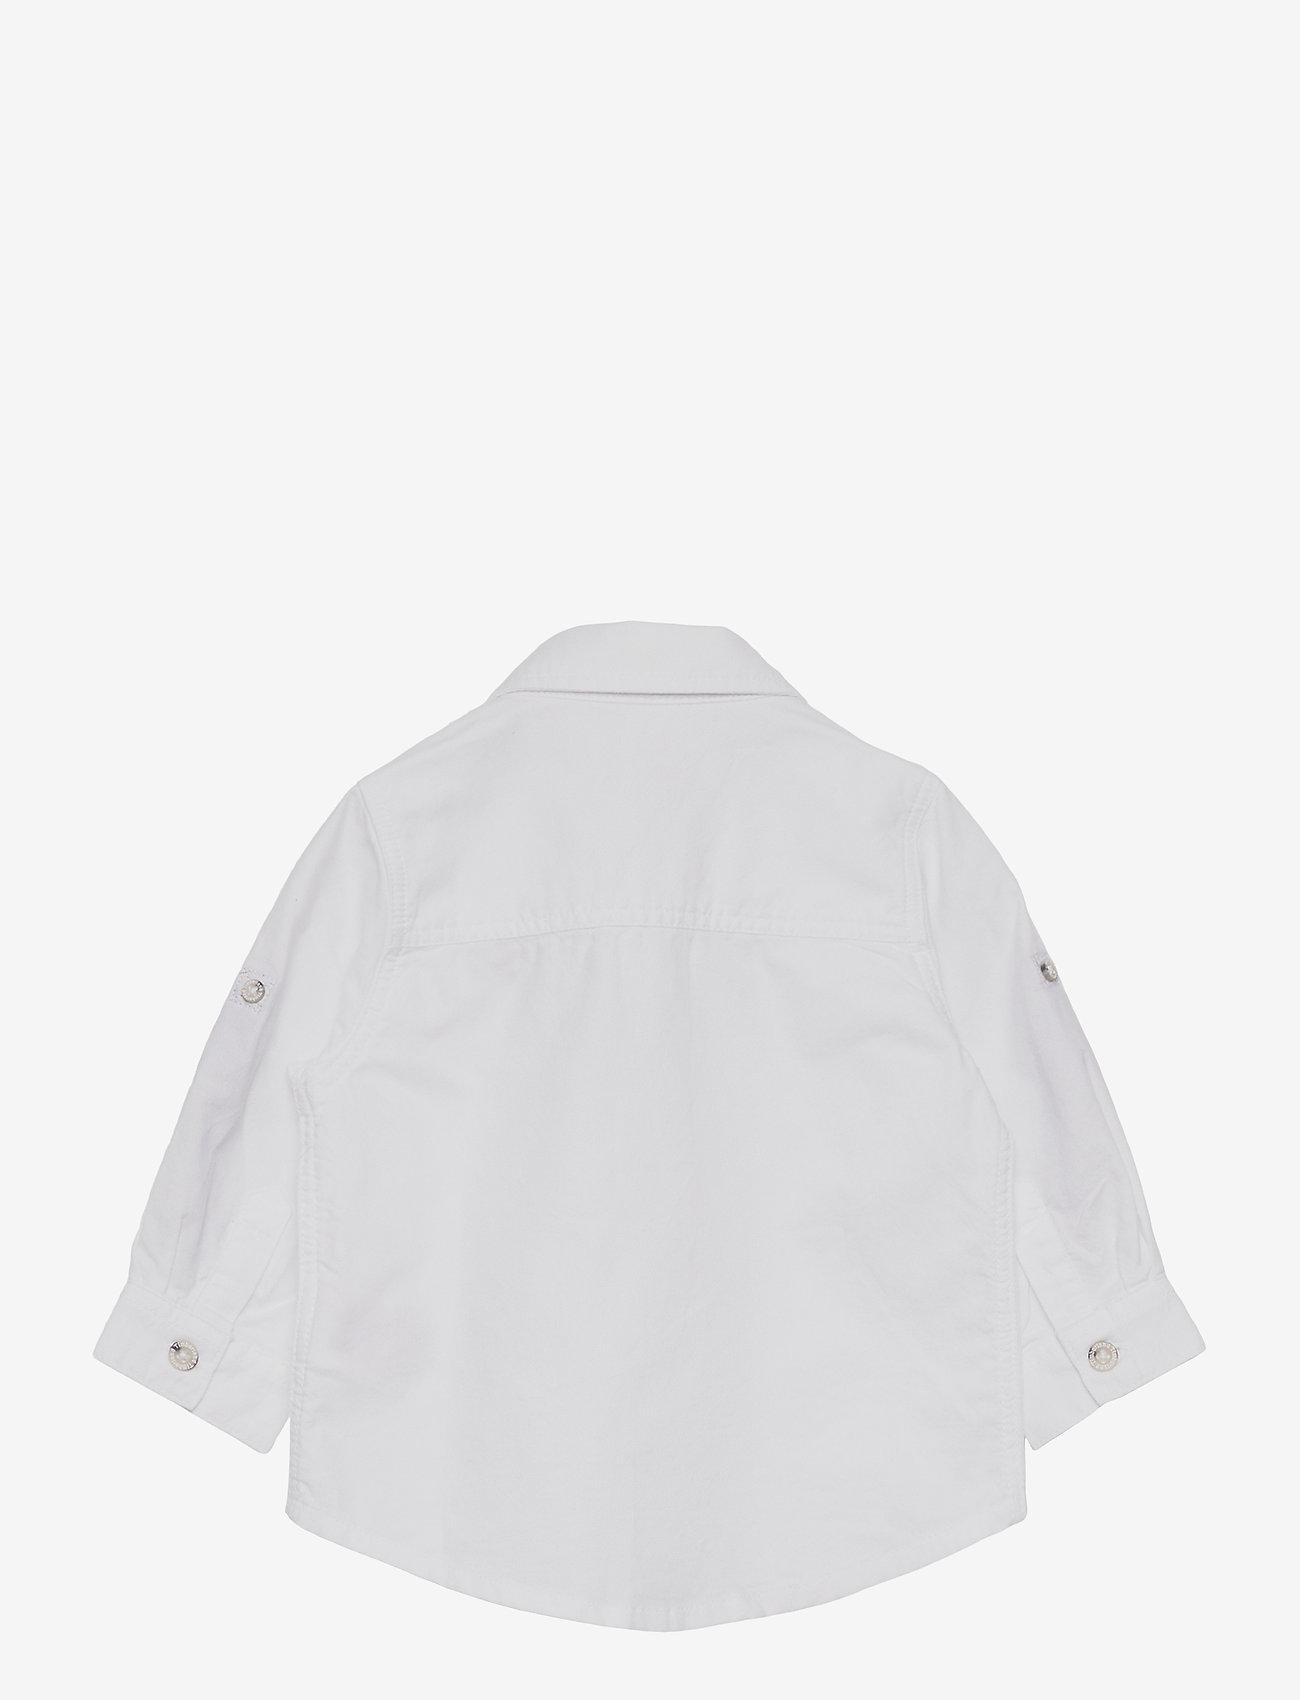 Timberland - LONG SLEEVED SHIRT - shirts - white - 1